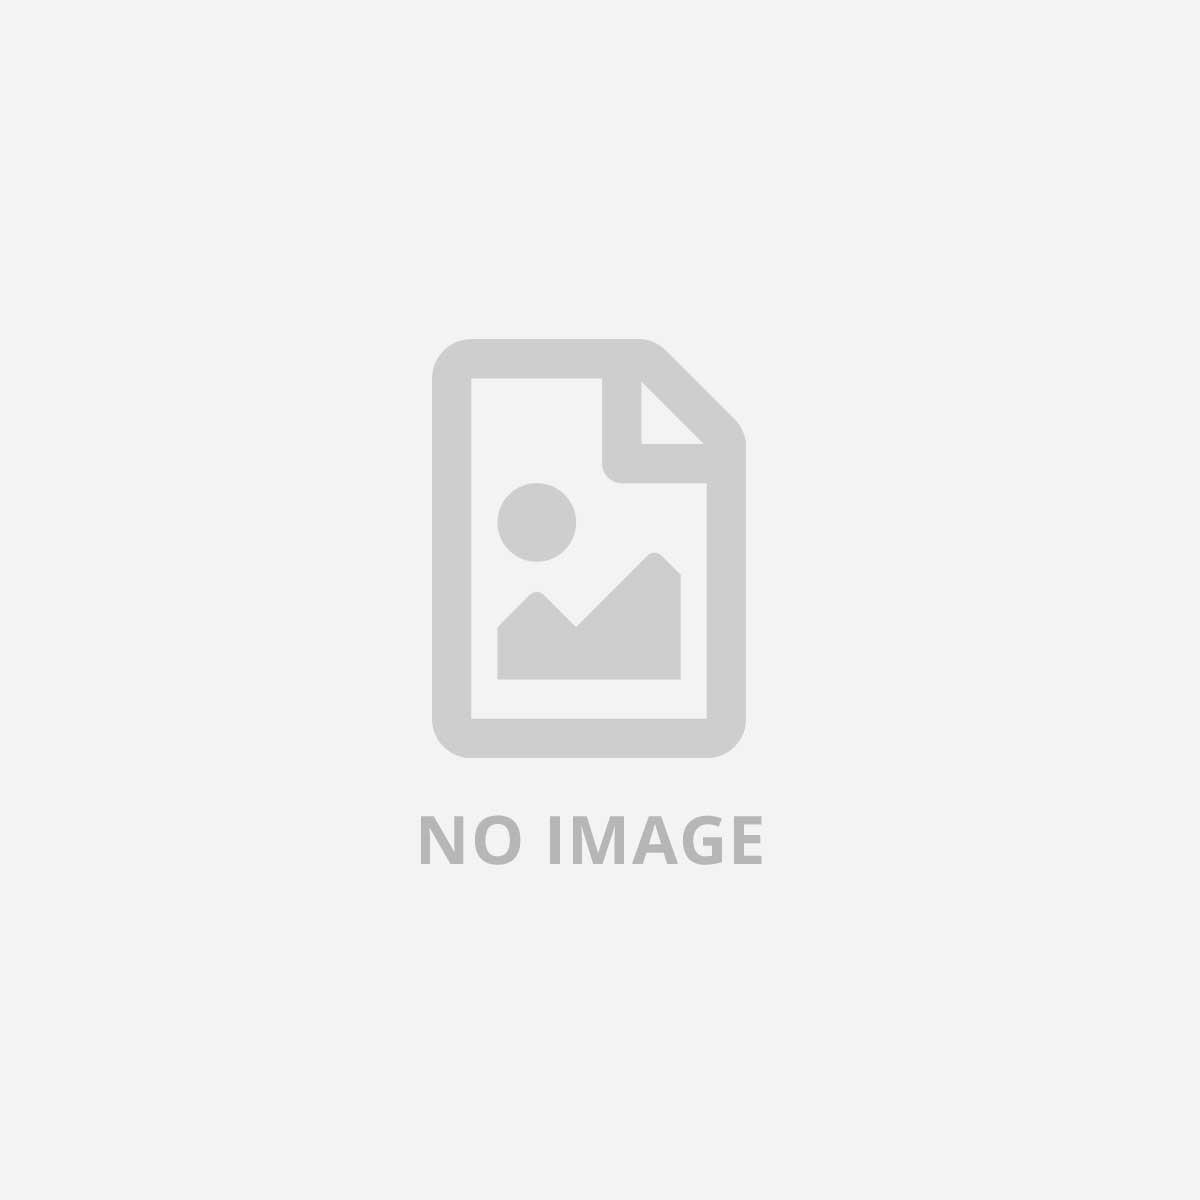 HP INC SAMSUNG SL-DPX501 SECONDARY EXIT